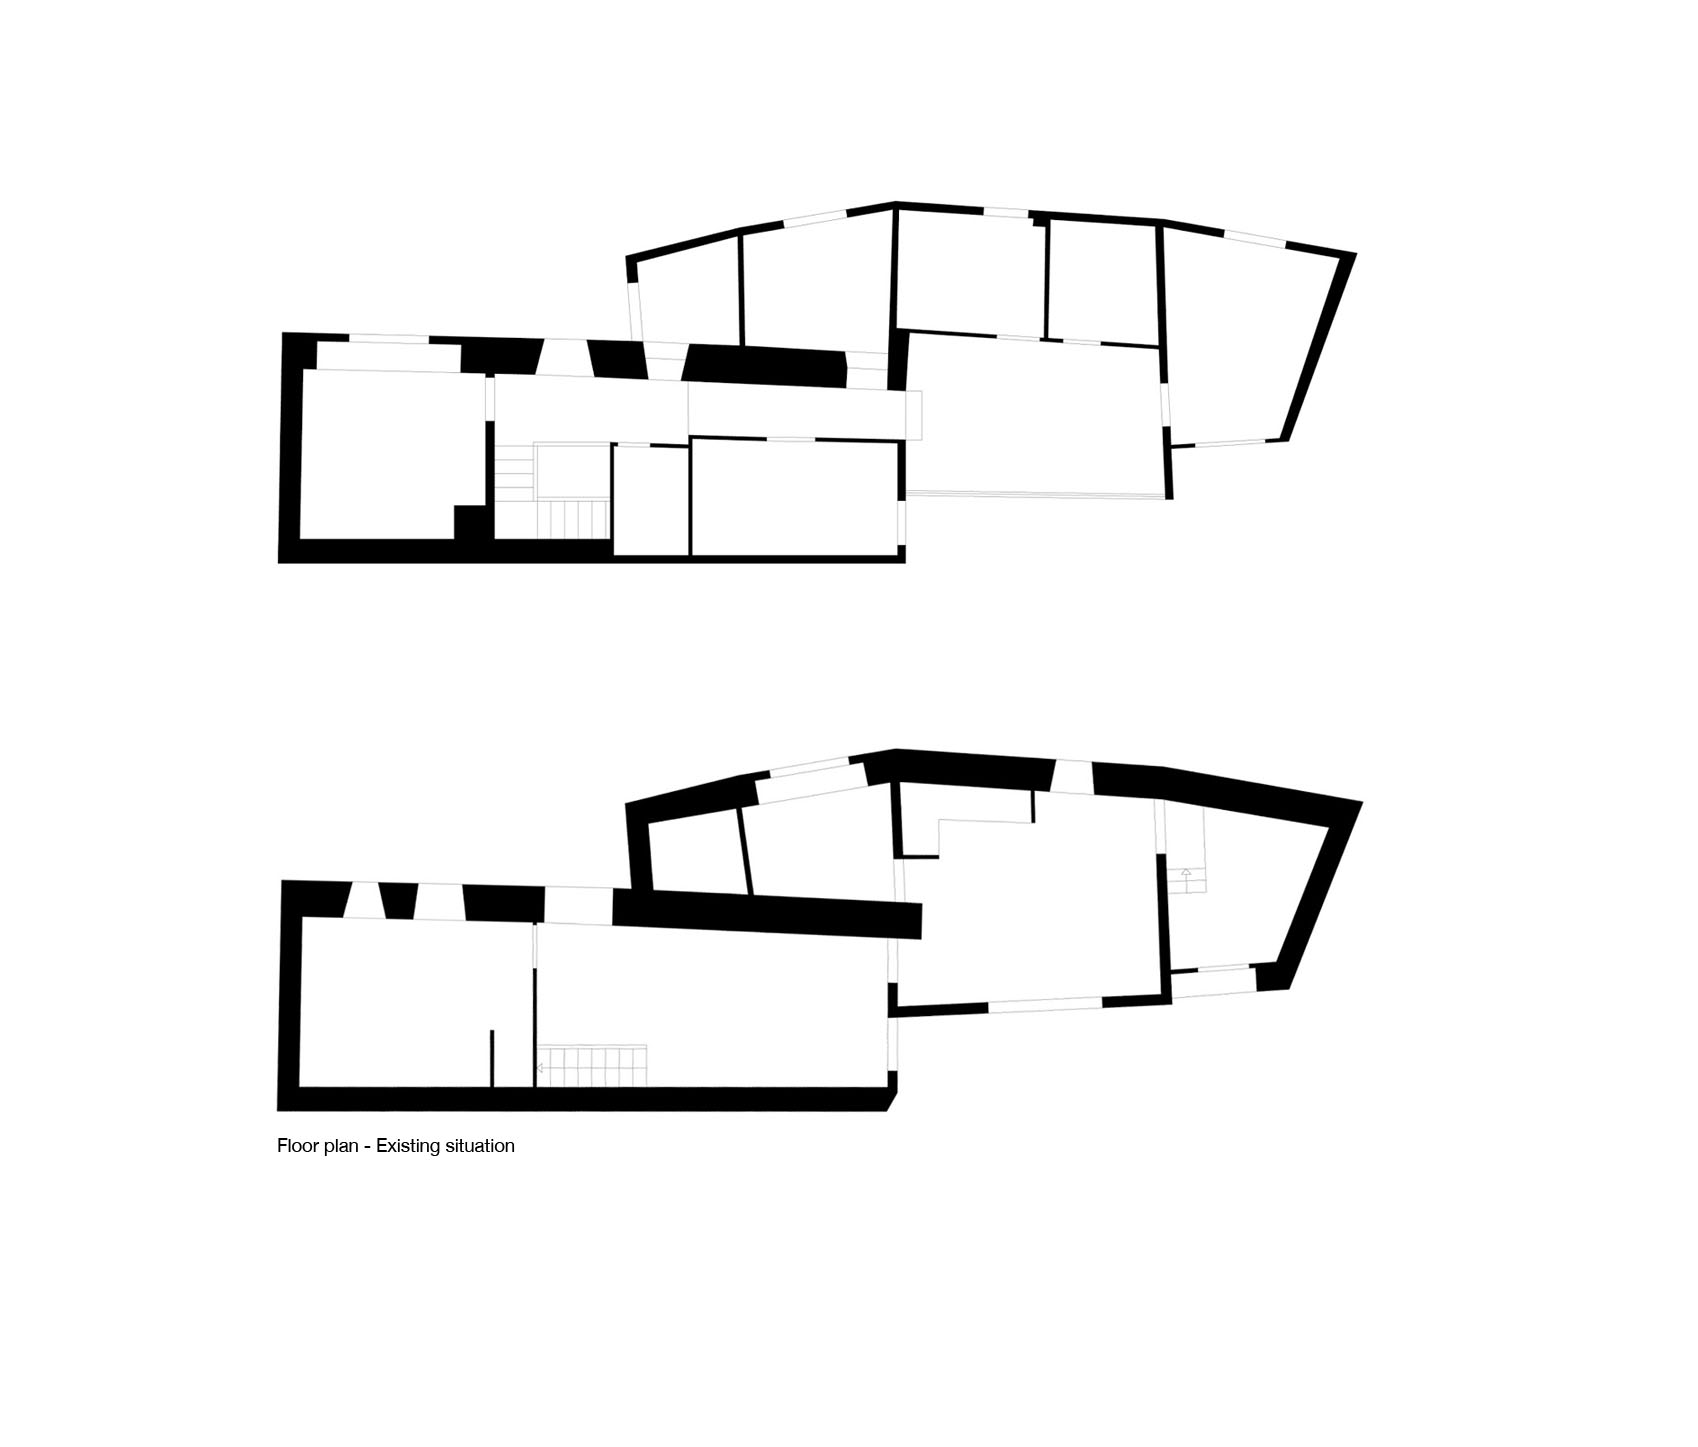 Private House-Celorio-Image 05.jpg